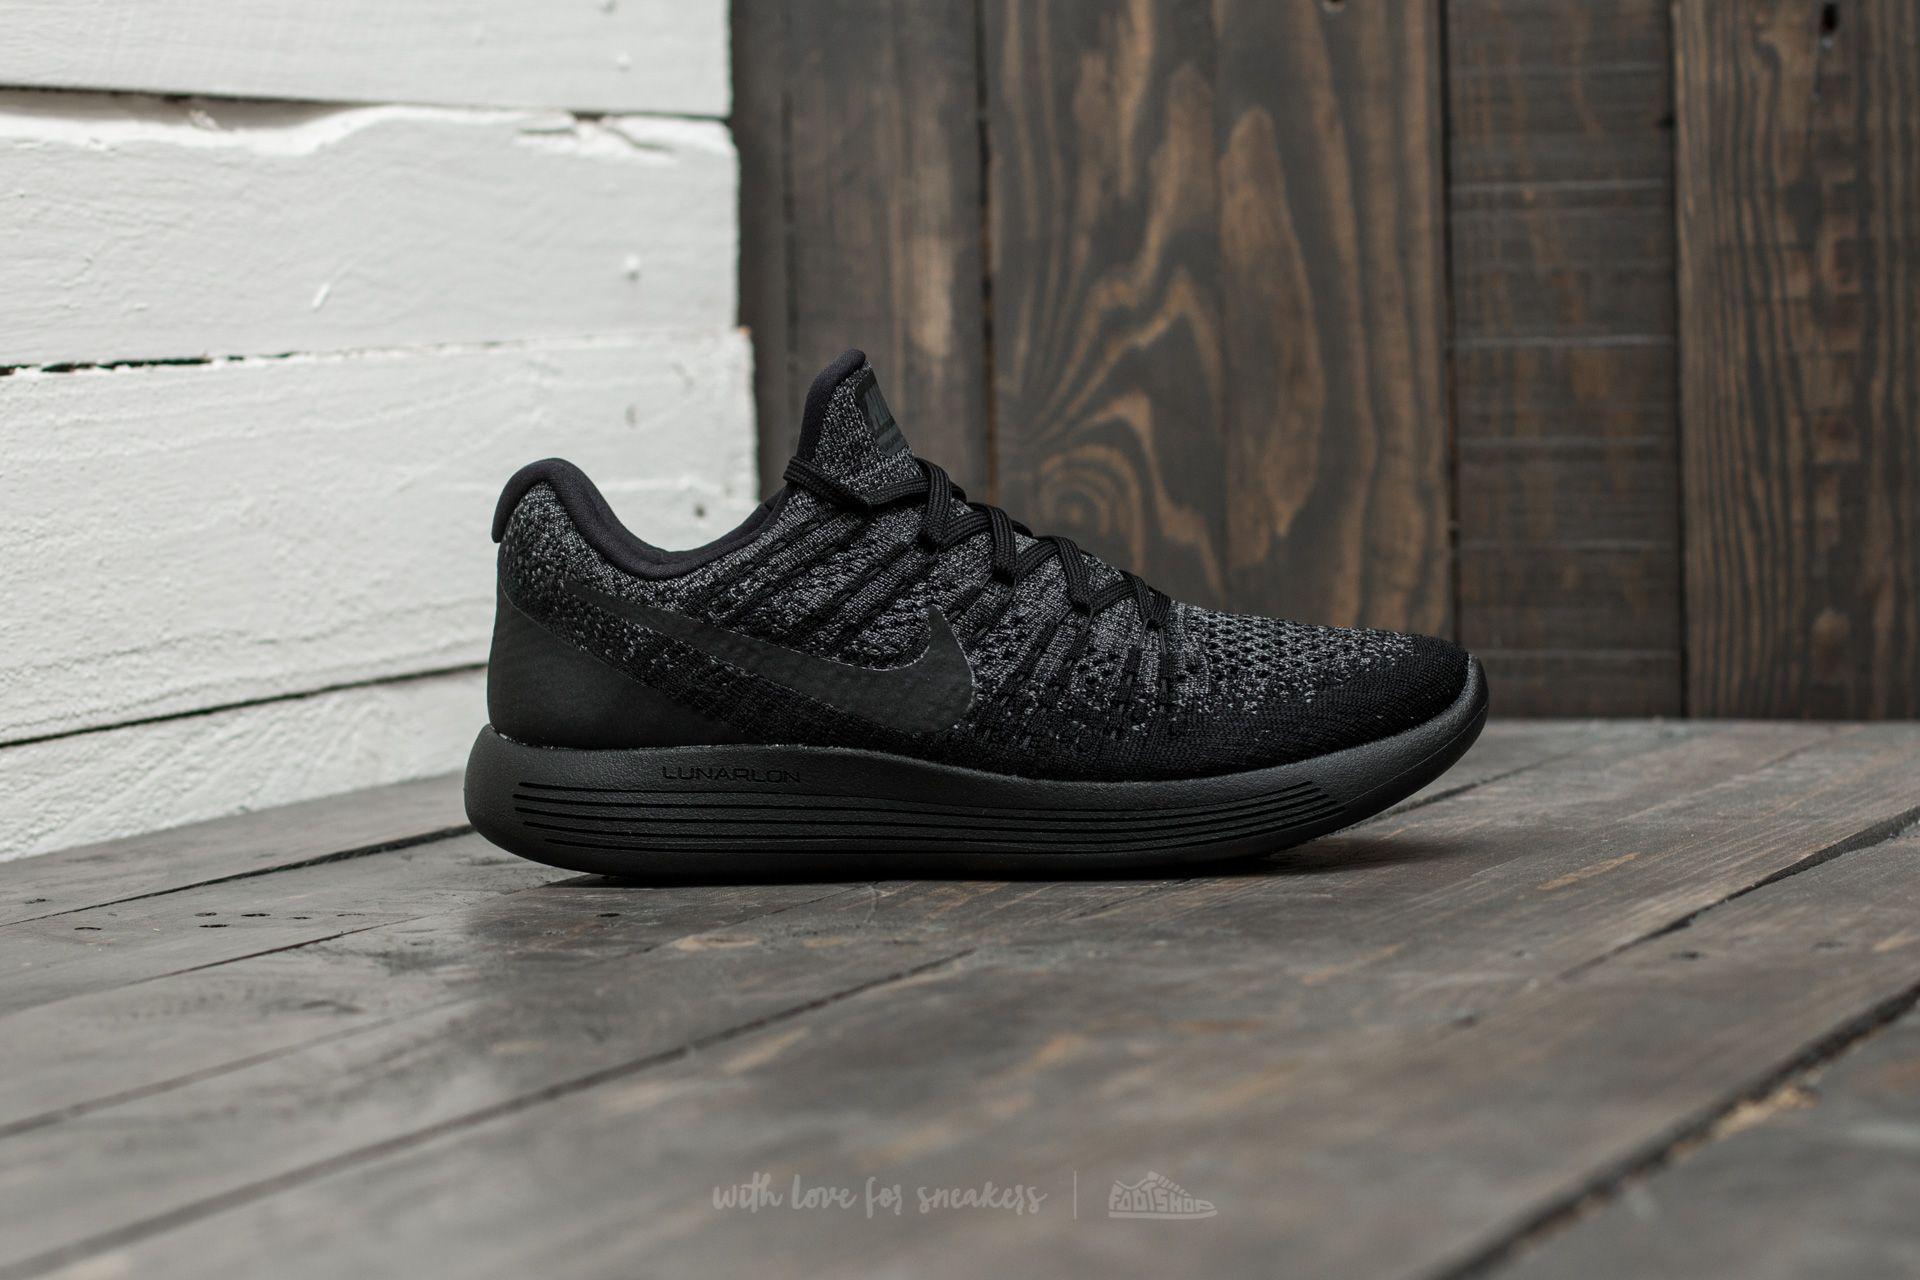 c14ba875a75 Lyst - Nike Lunarepic Low Flyknit 2 W Black  Black-dark Grey in Black